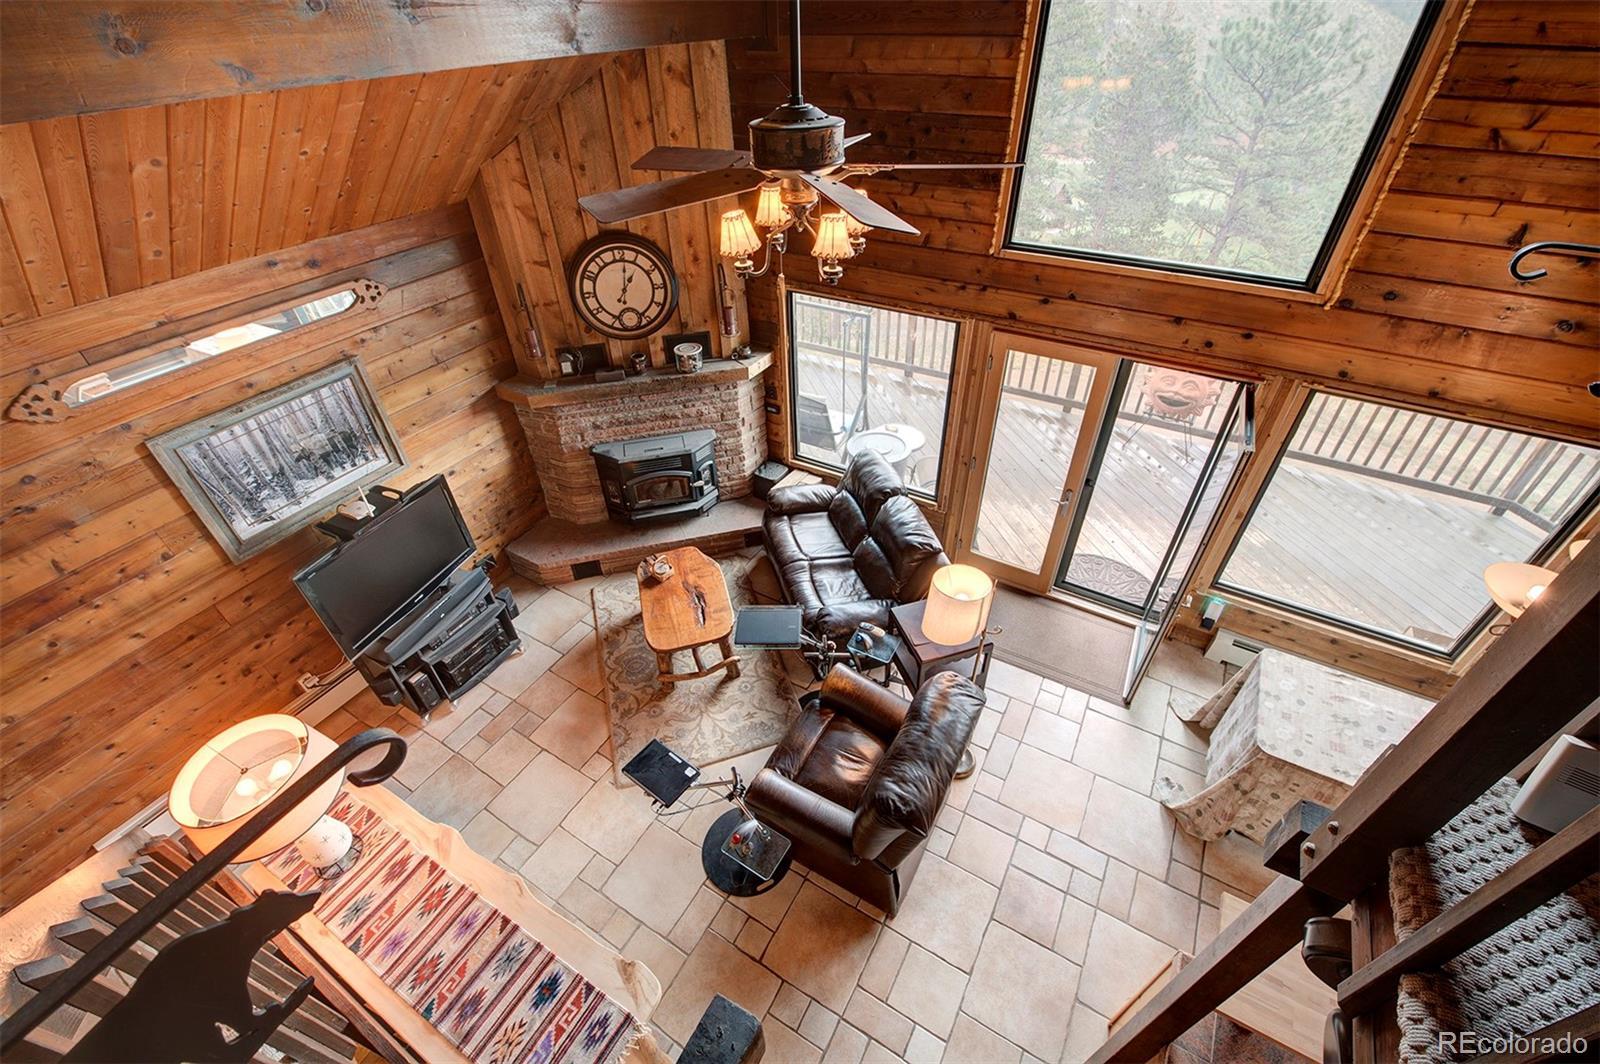 MLS# 6922377 - 9 - 12123 Geronimo Trail, Conifer, CO 80433